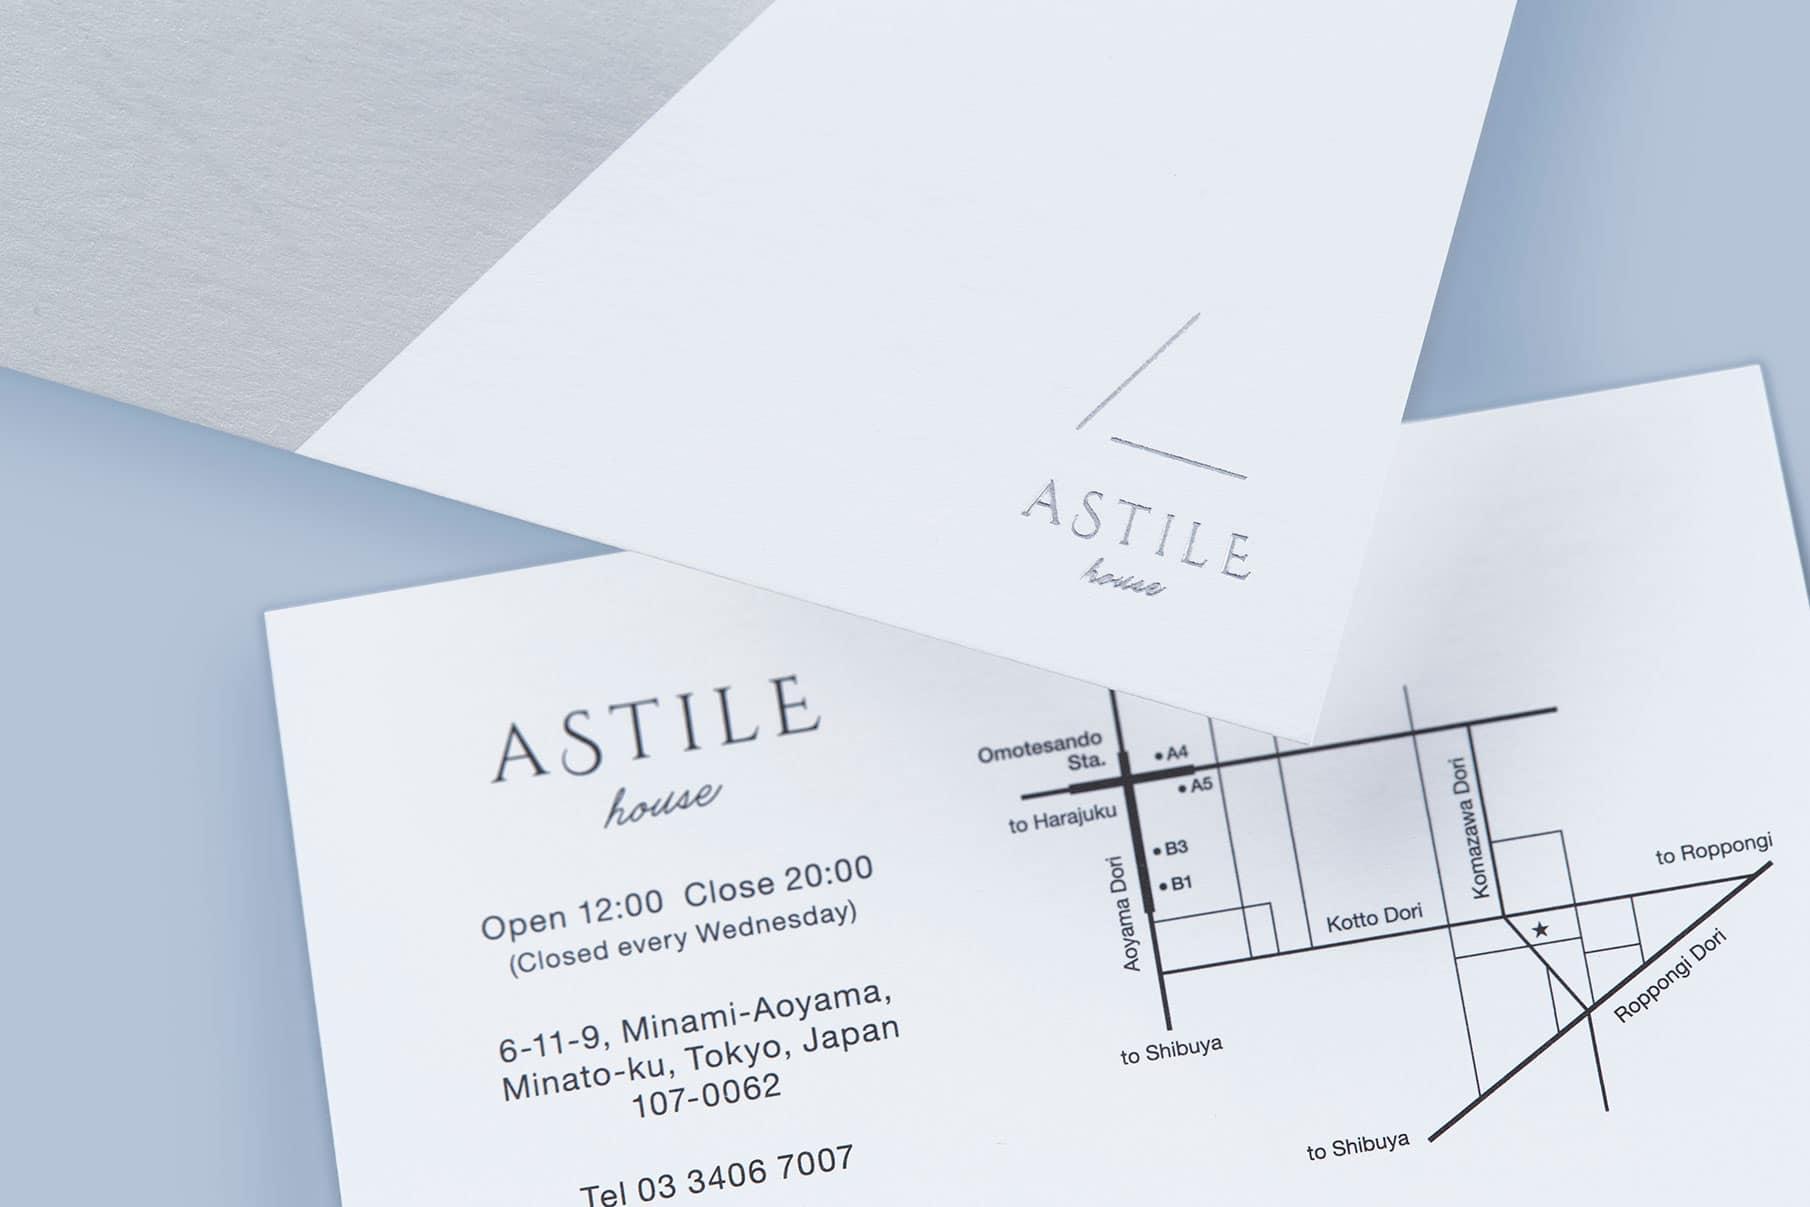 ASTILE house - Shop Tools 8